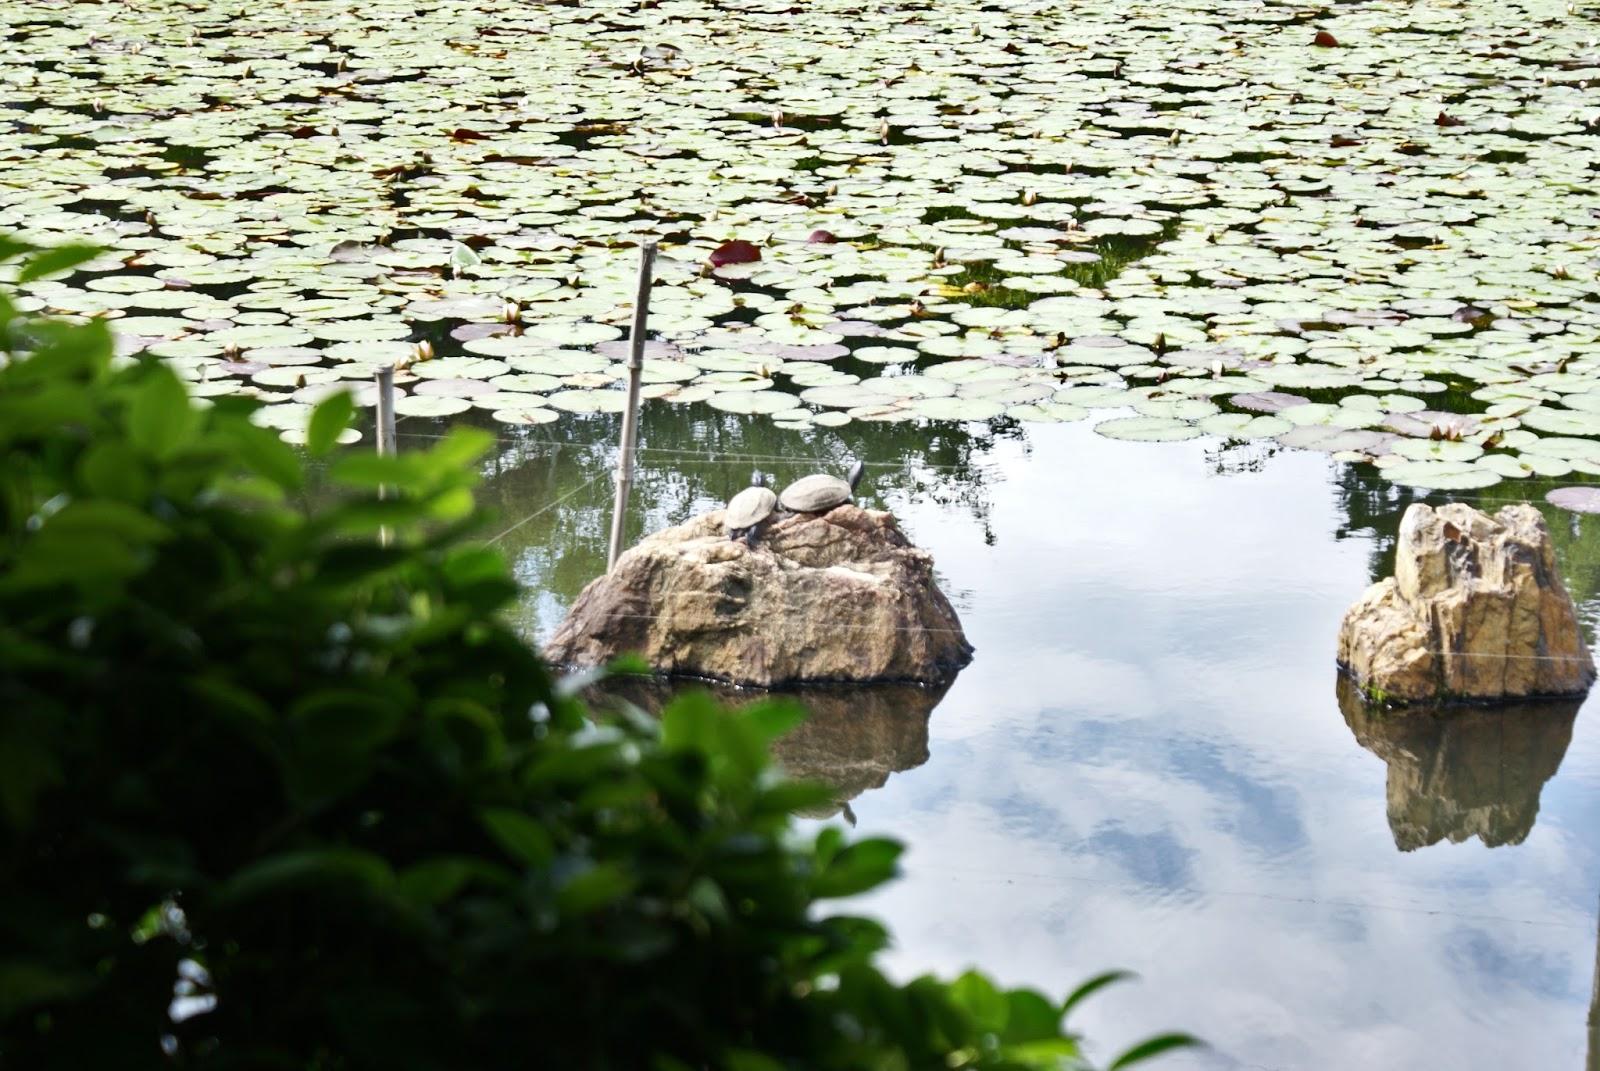 ryoan ji buddhist temple turtles kyoto kansai japan asia